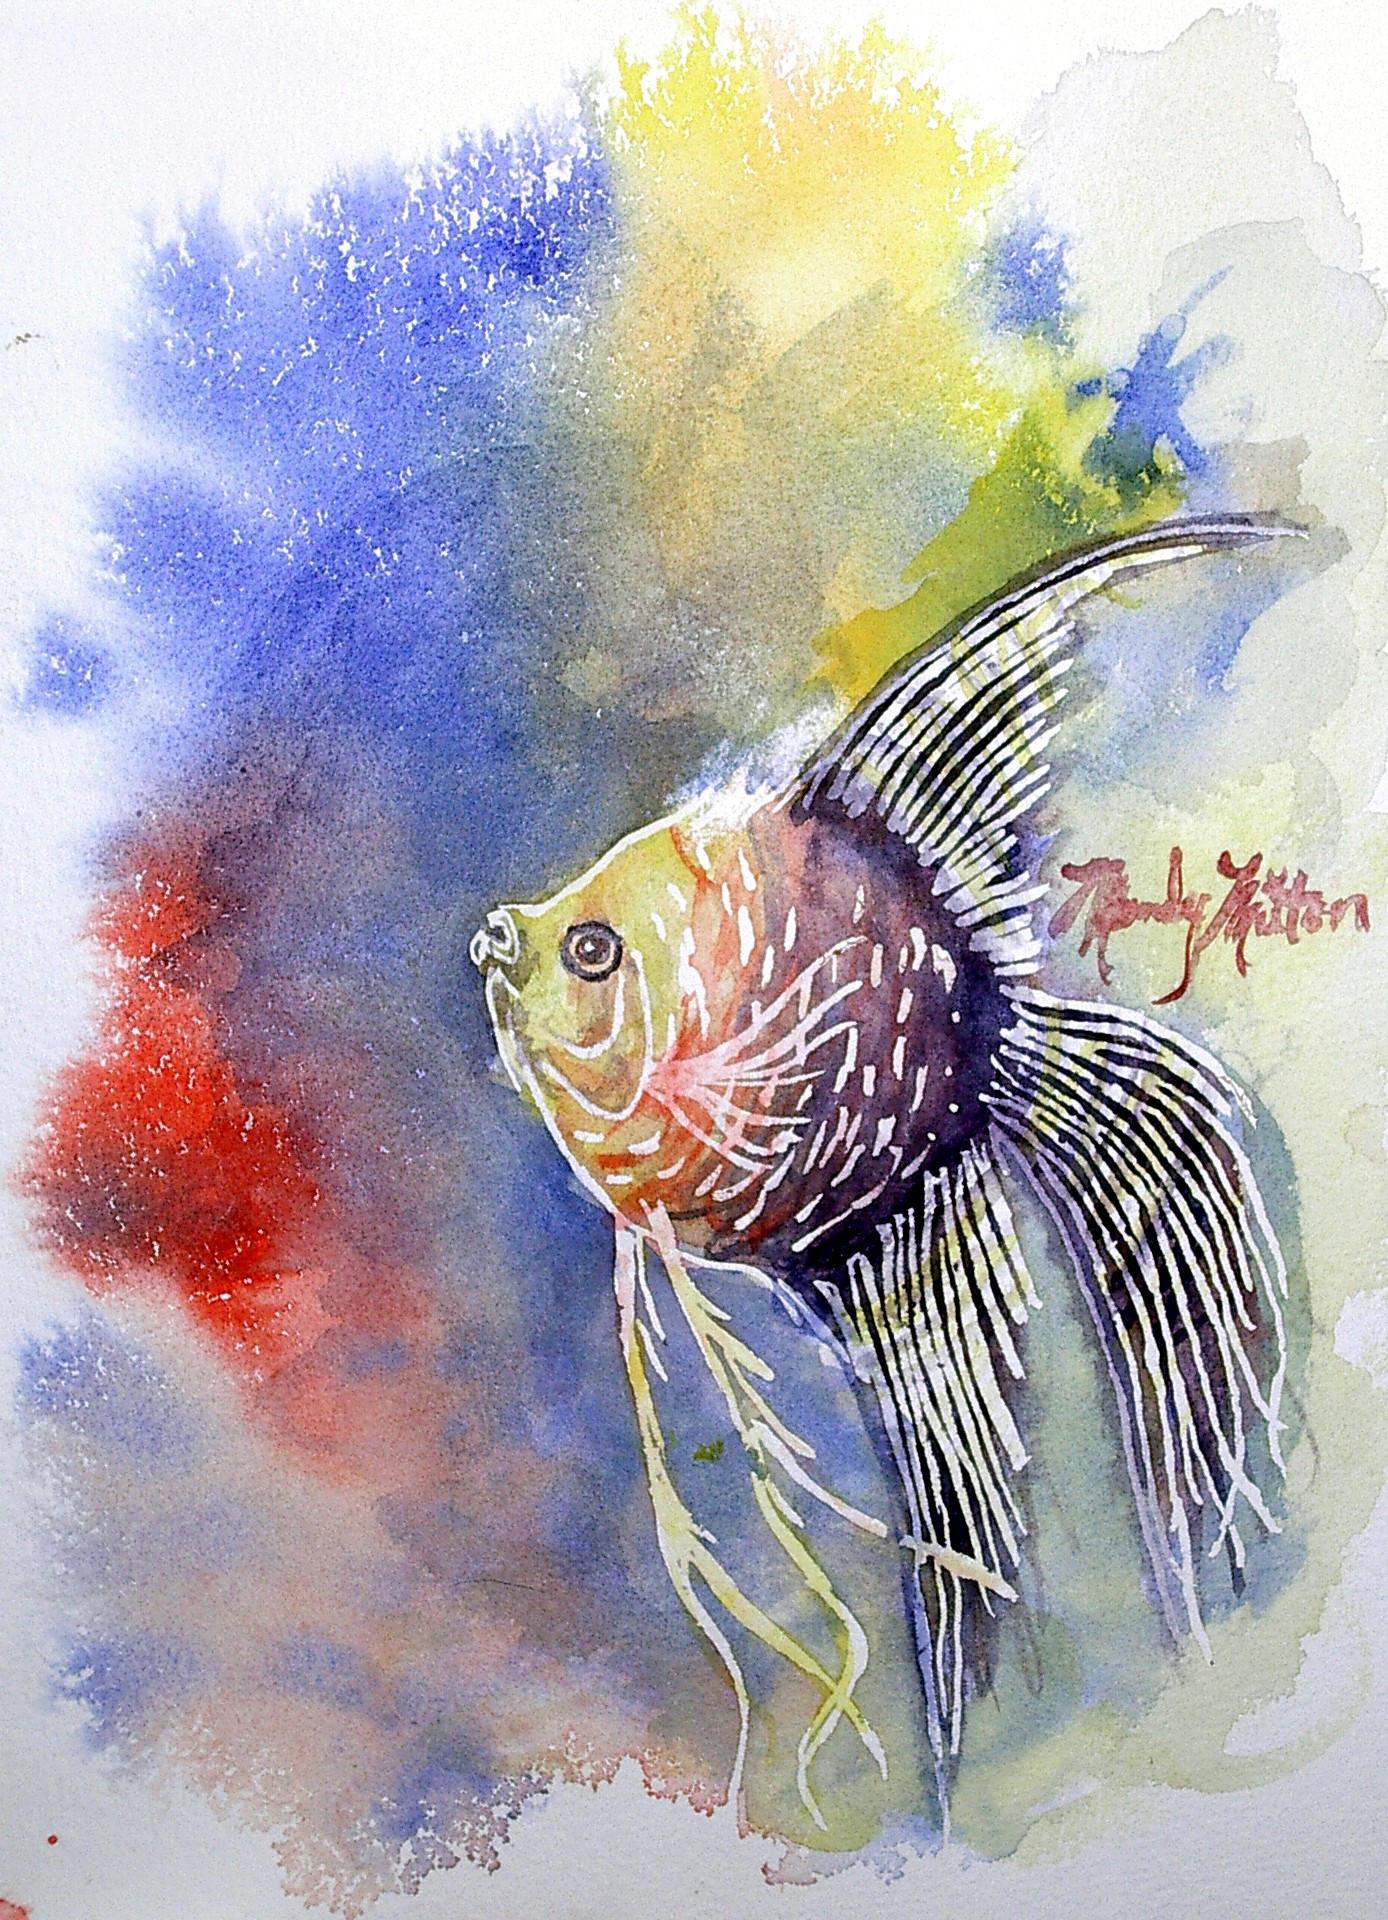 Watercolor angelfish by mandylynn on DeviantArt